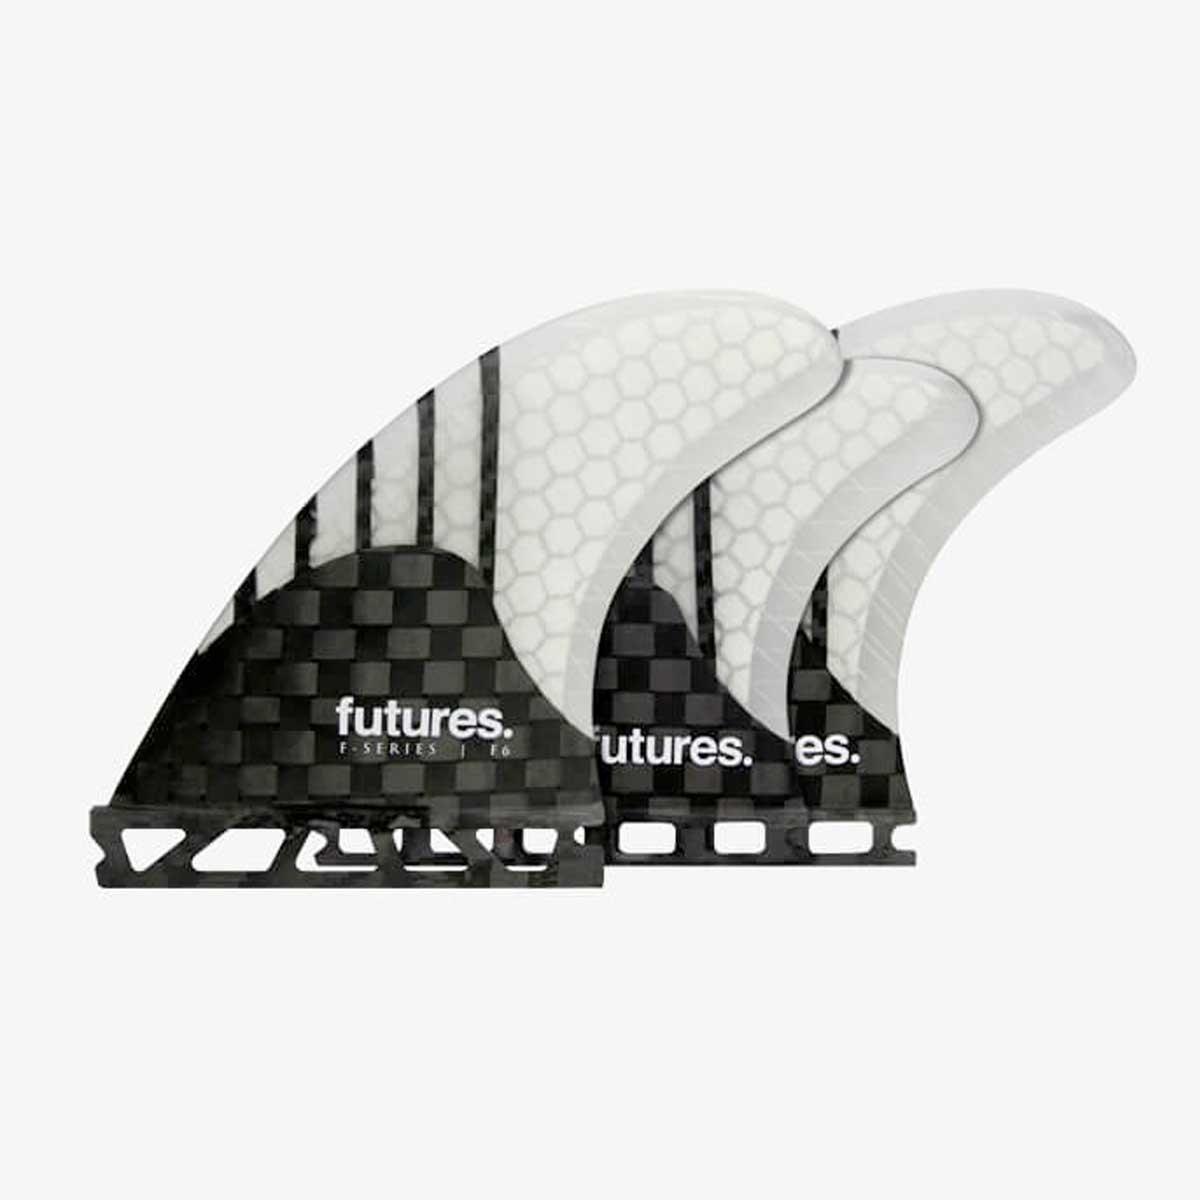 ailerons-5-fins-futures-f6-generation-series-m